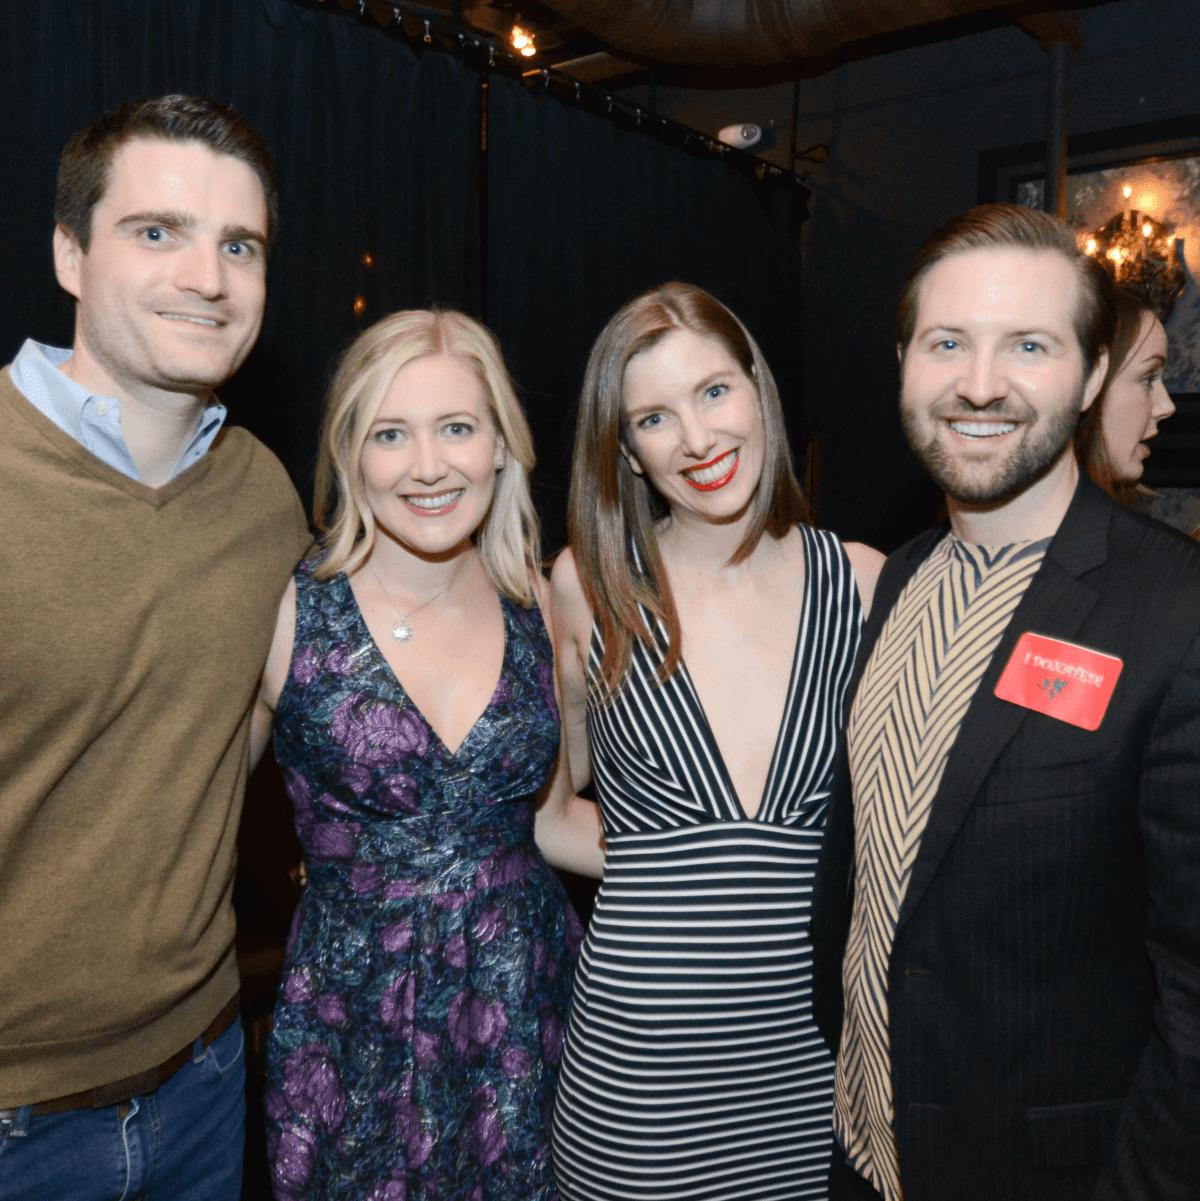 1.Marcus Skelly, Kendall Kinsman, Megan Gallman, Robert Gallman